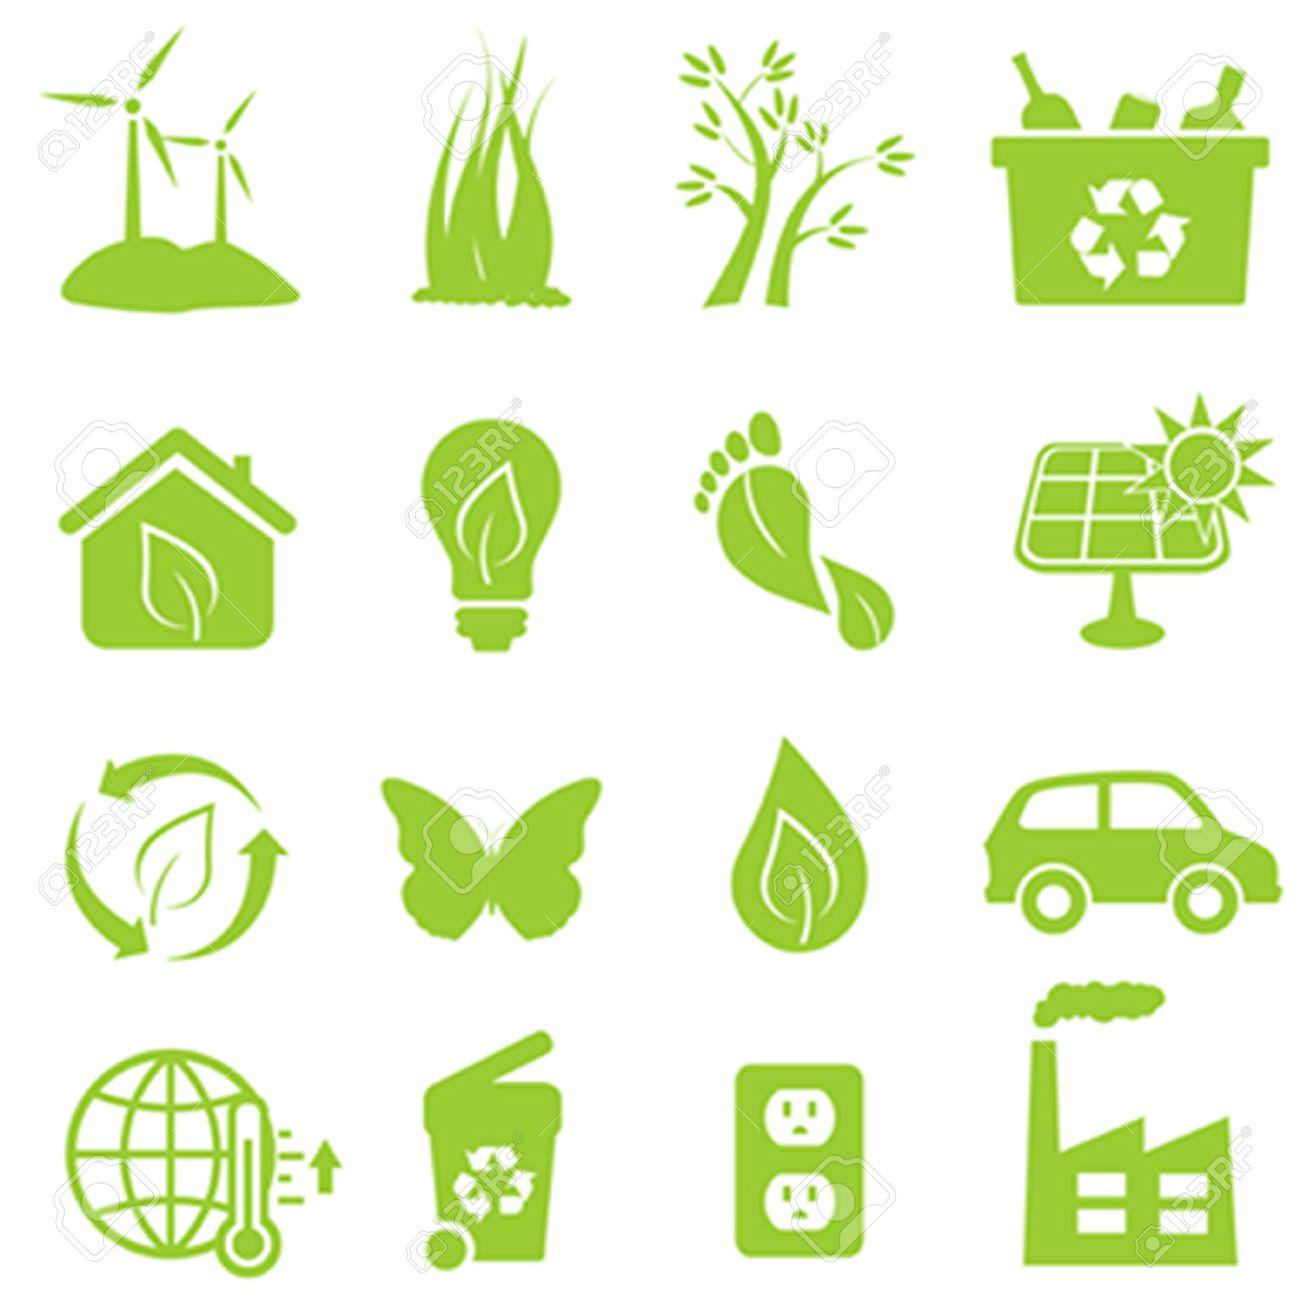 Eco and environment icon set - 44476694